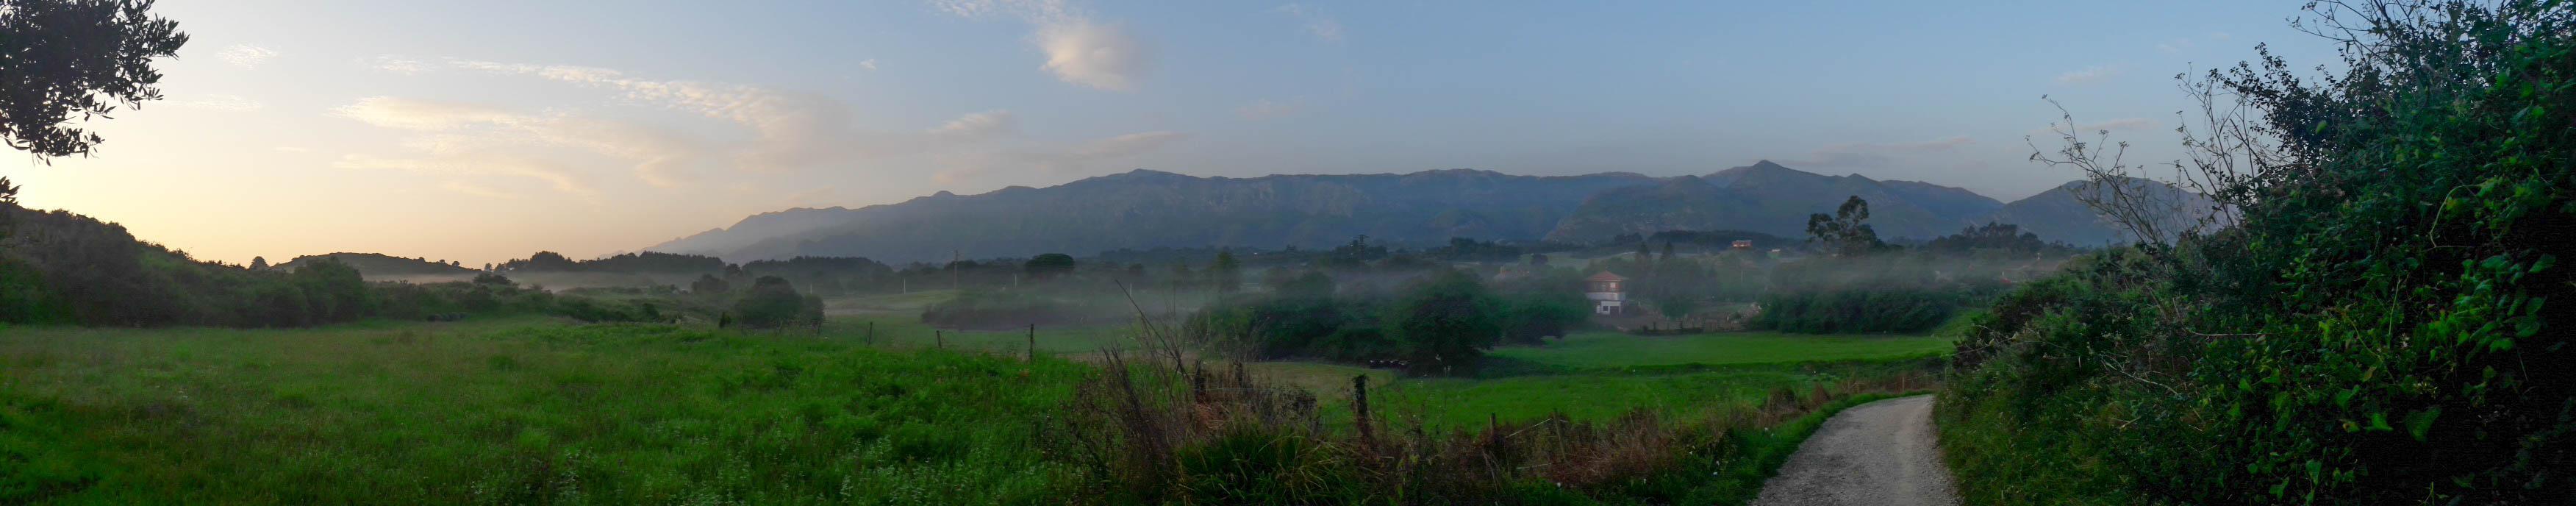 Sunrise on a misty morning, Asturias